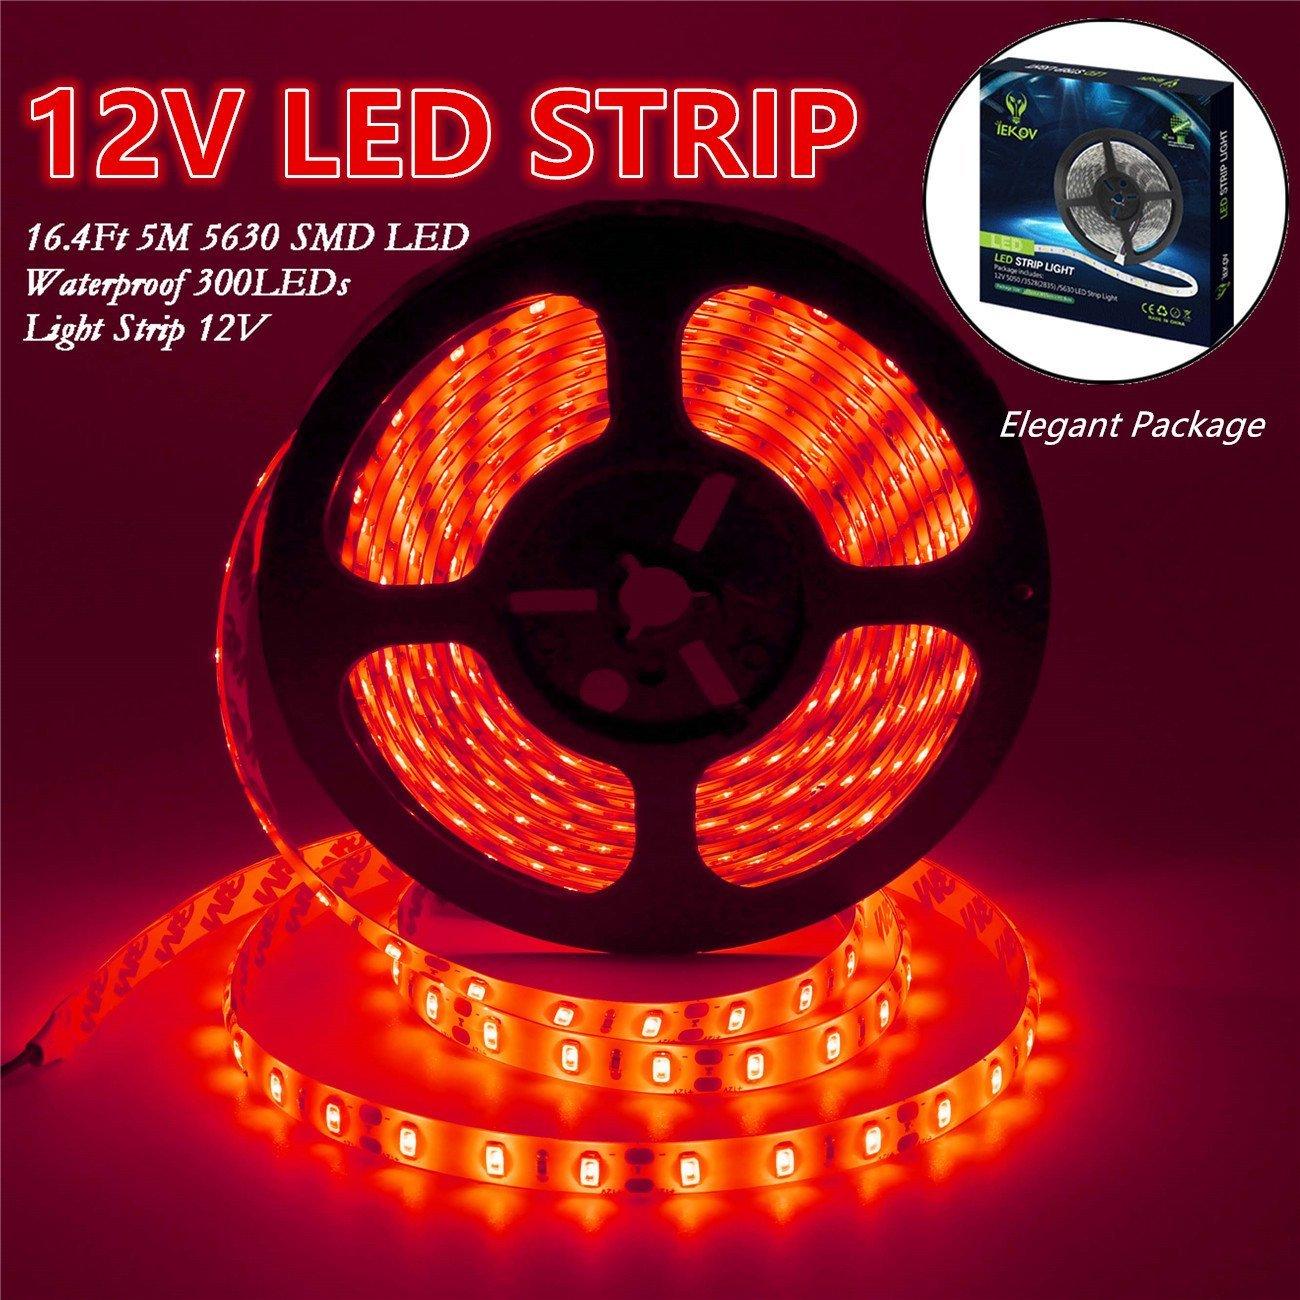 IEKOV Led Strip Lights, trade; 5630 SMD 300LEDs Waterproof Flexible Xmas Decorative Lighting Strips, LED Tape, 5M 16.4Ft DC12V (Red)